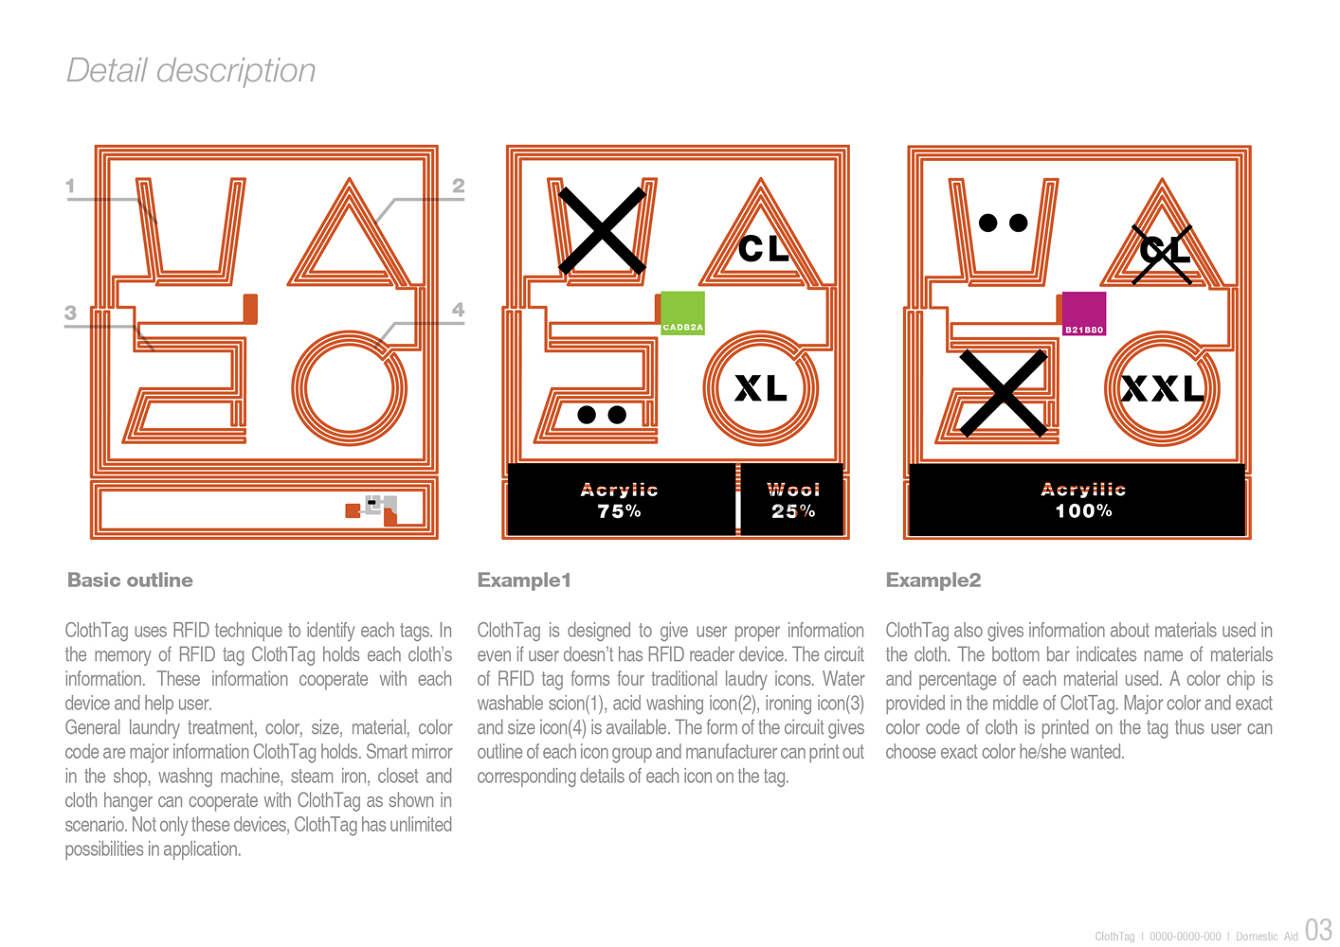 clothtag - ID+IM Design Lab